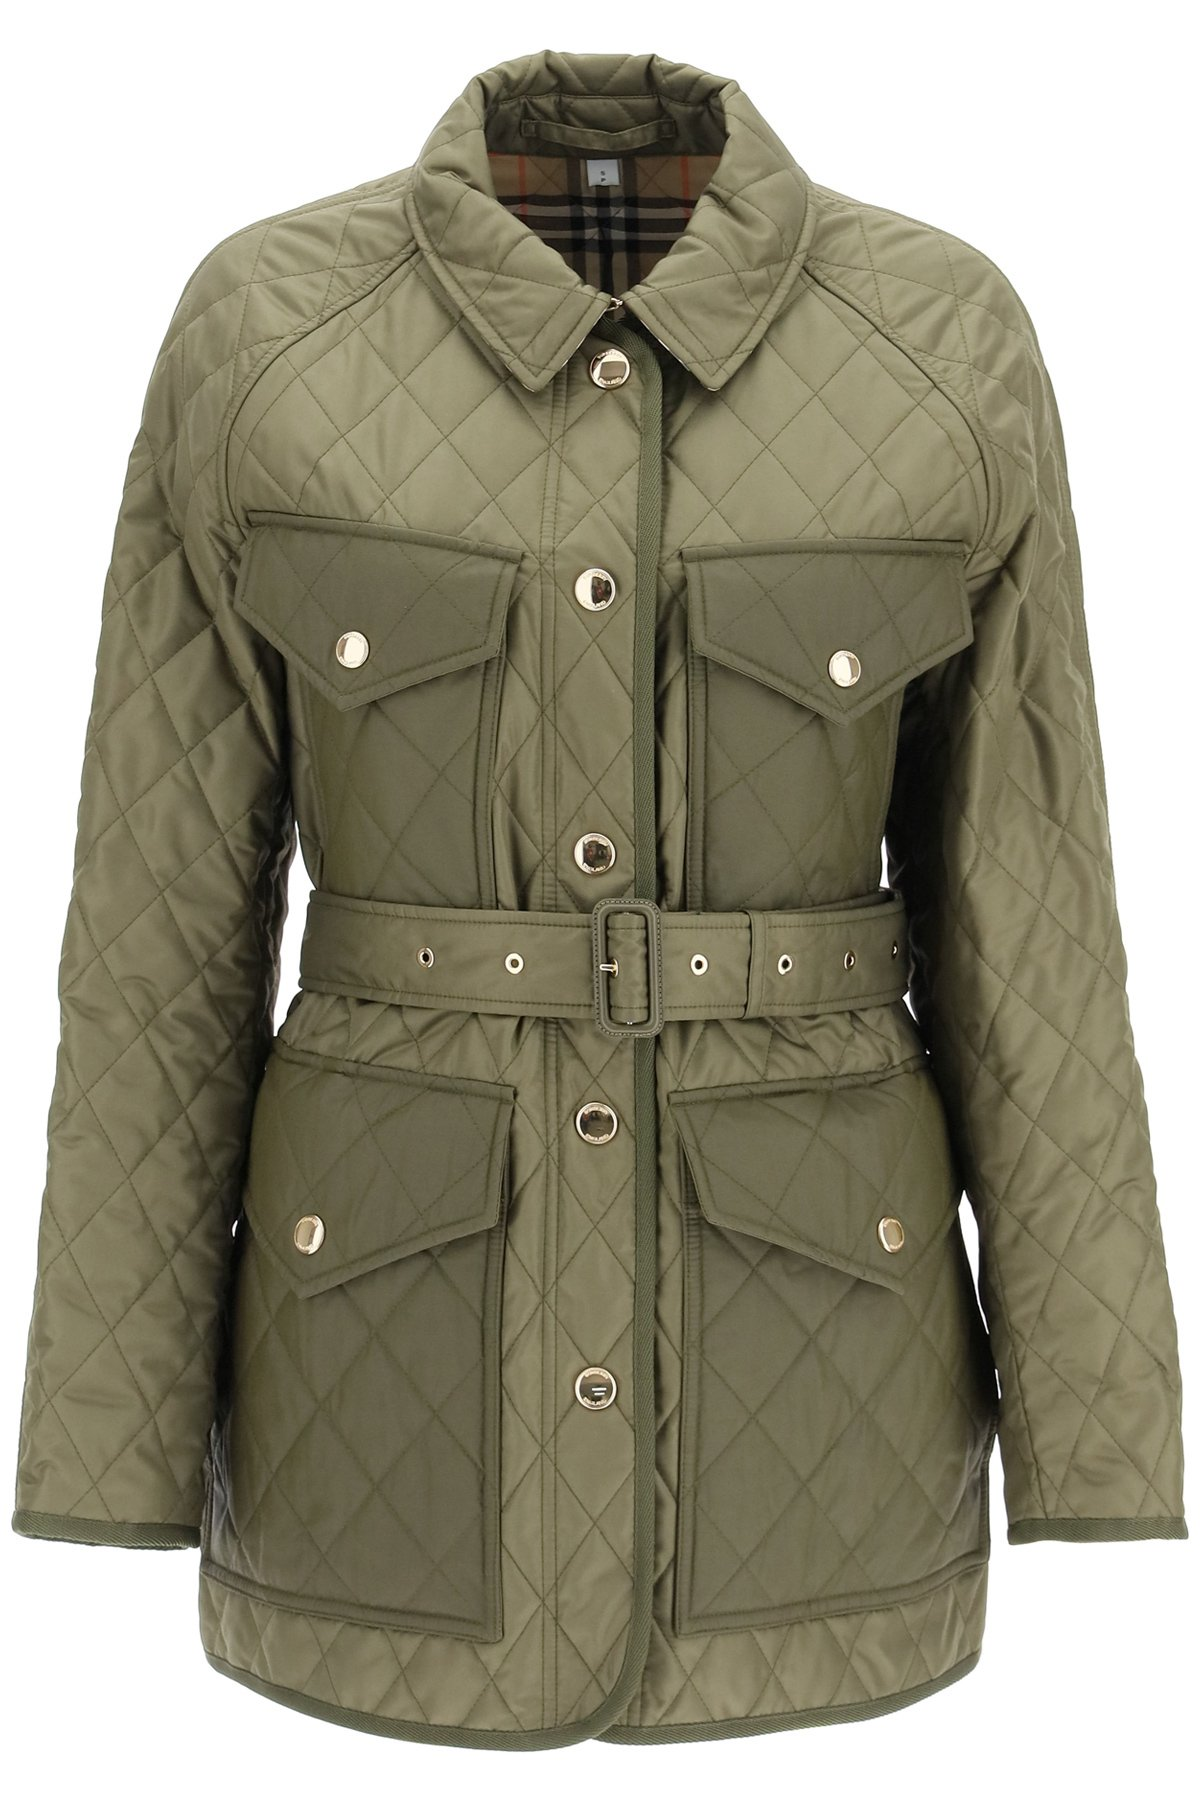 Burberry jacket kemble trapuntato